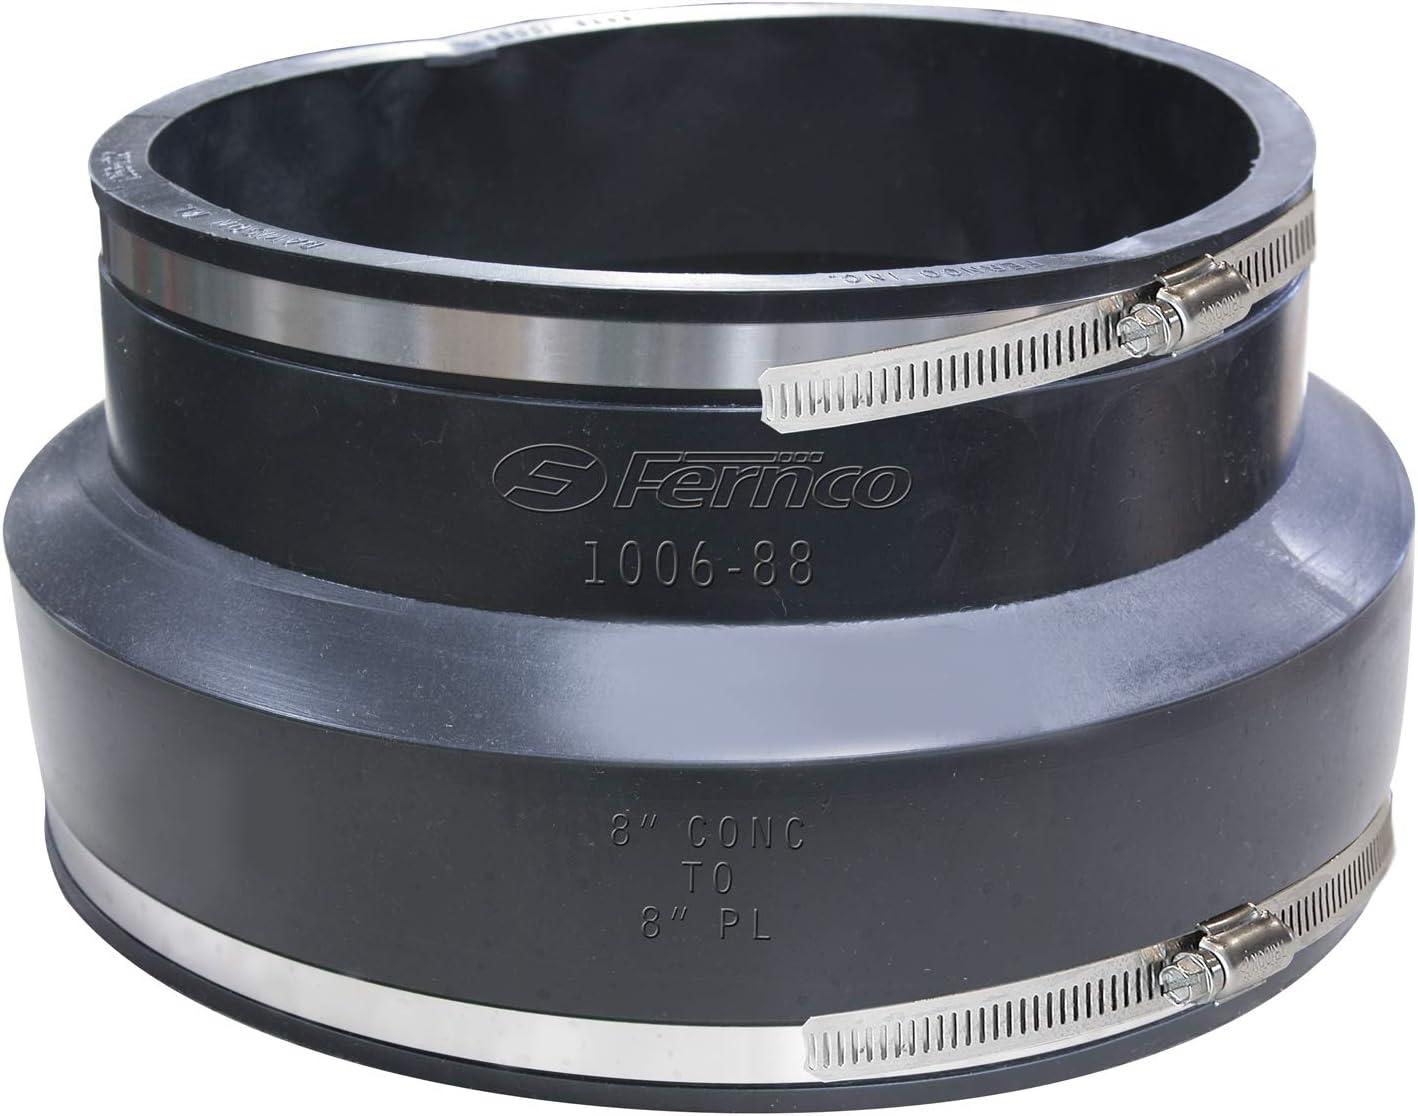 1006-88 Fernco 8 x 8 Flexible Coupling